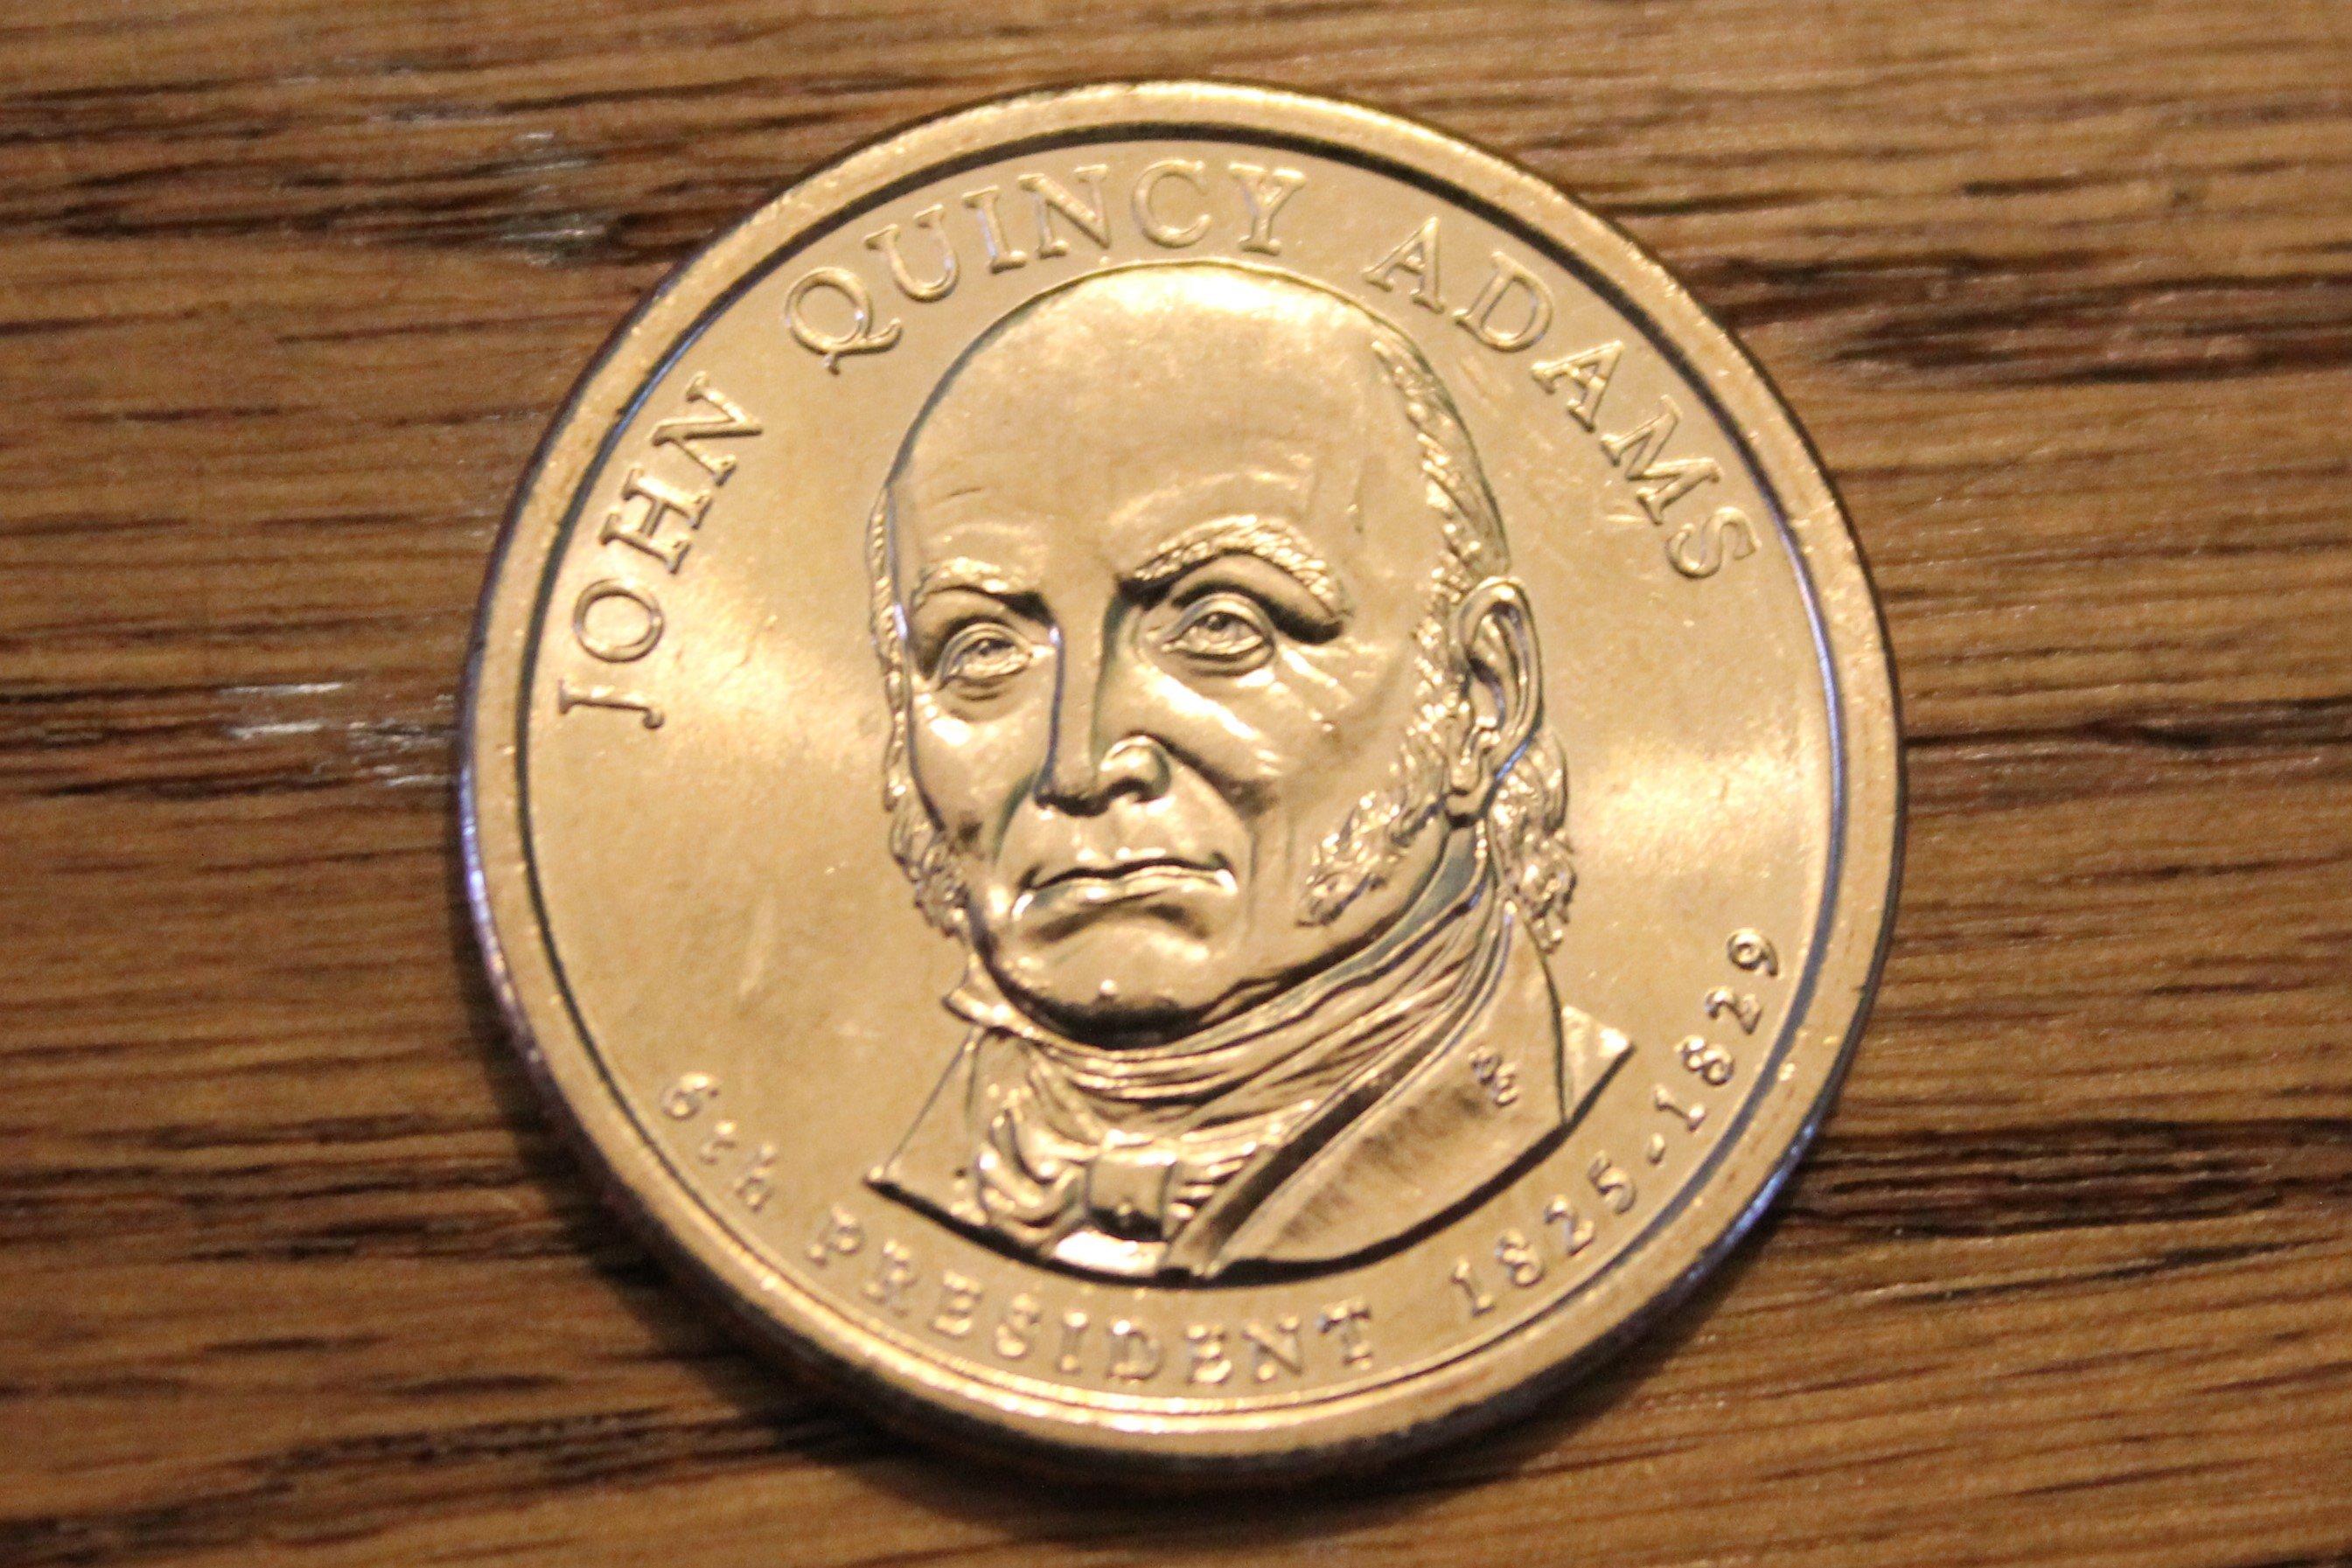 P John Quincy Adams Presidential Dollar